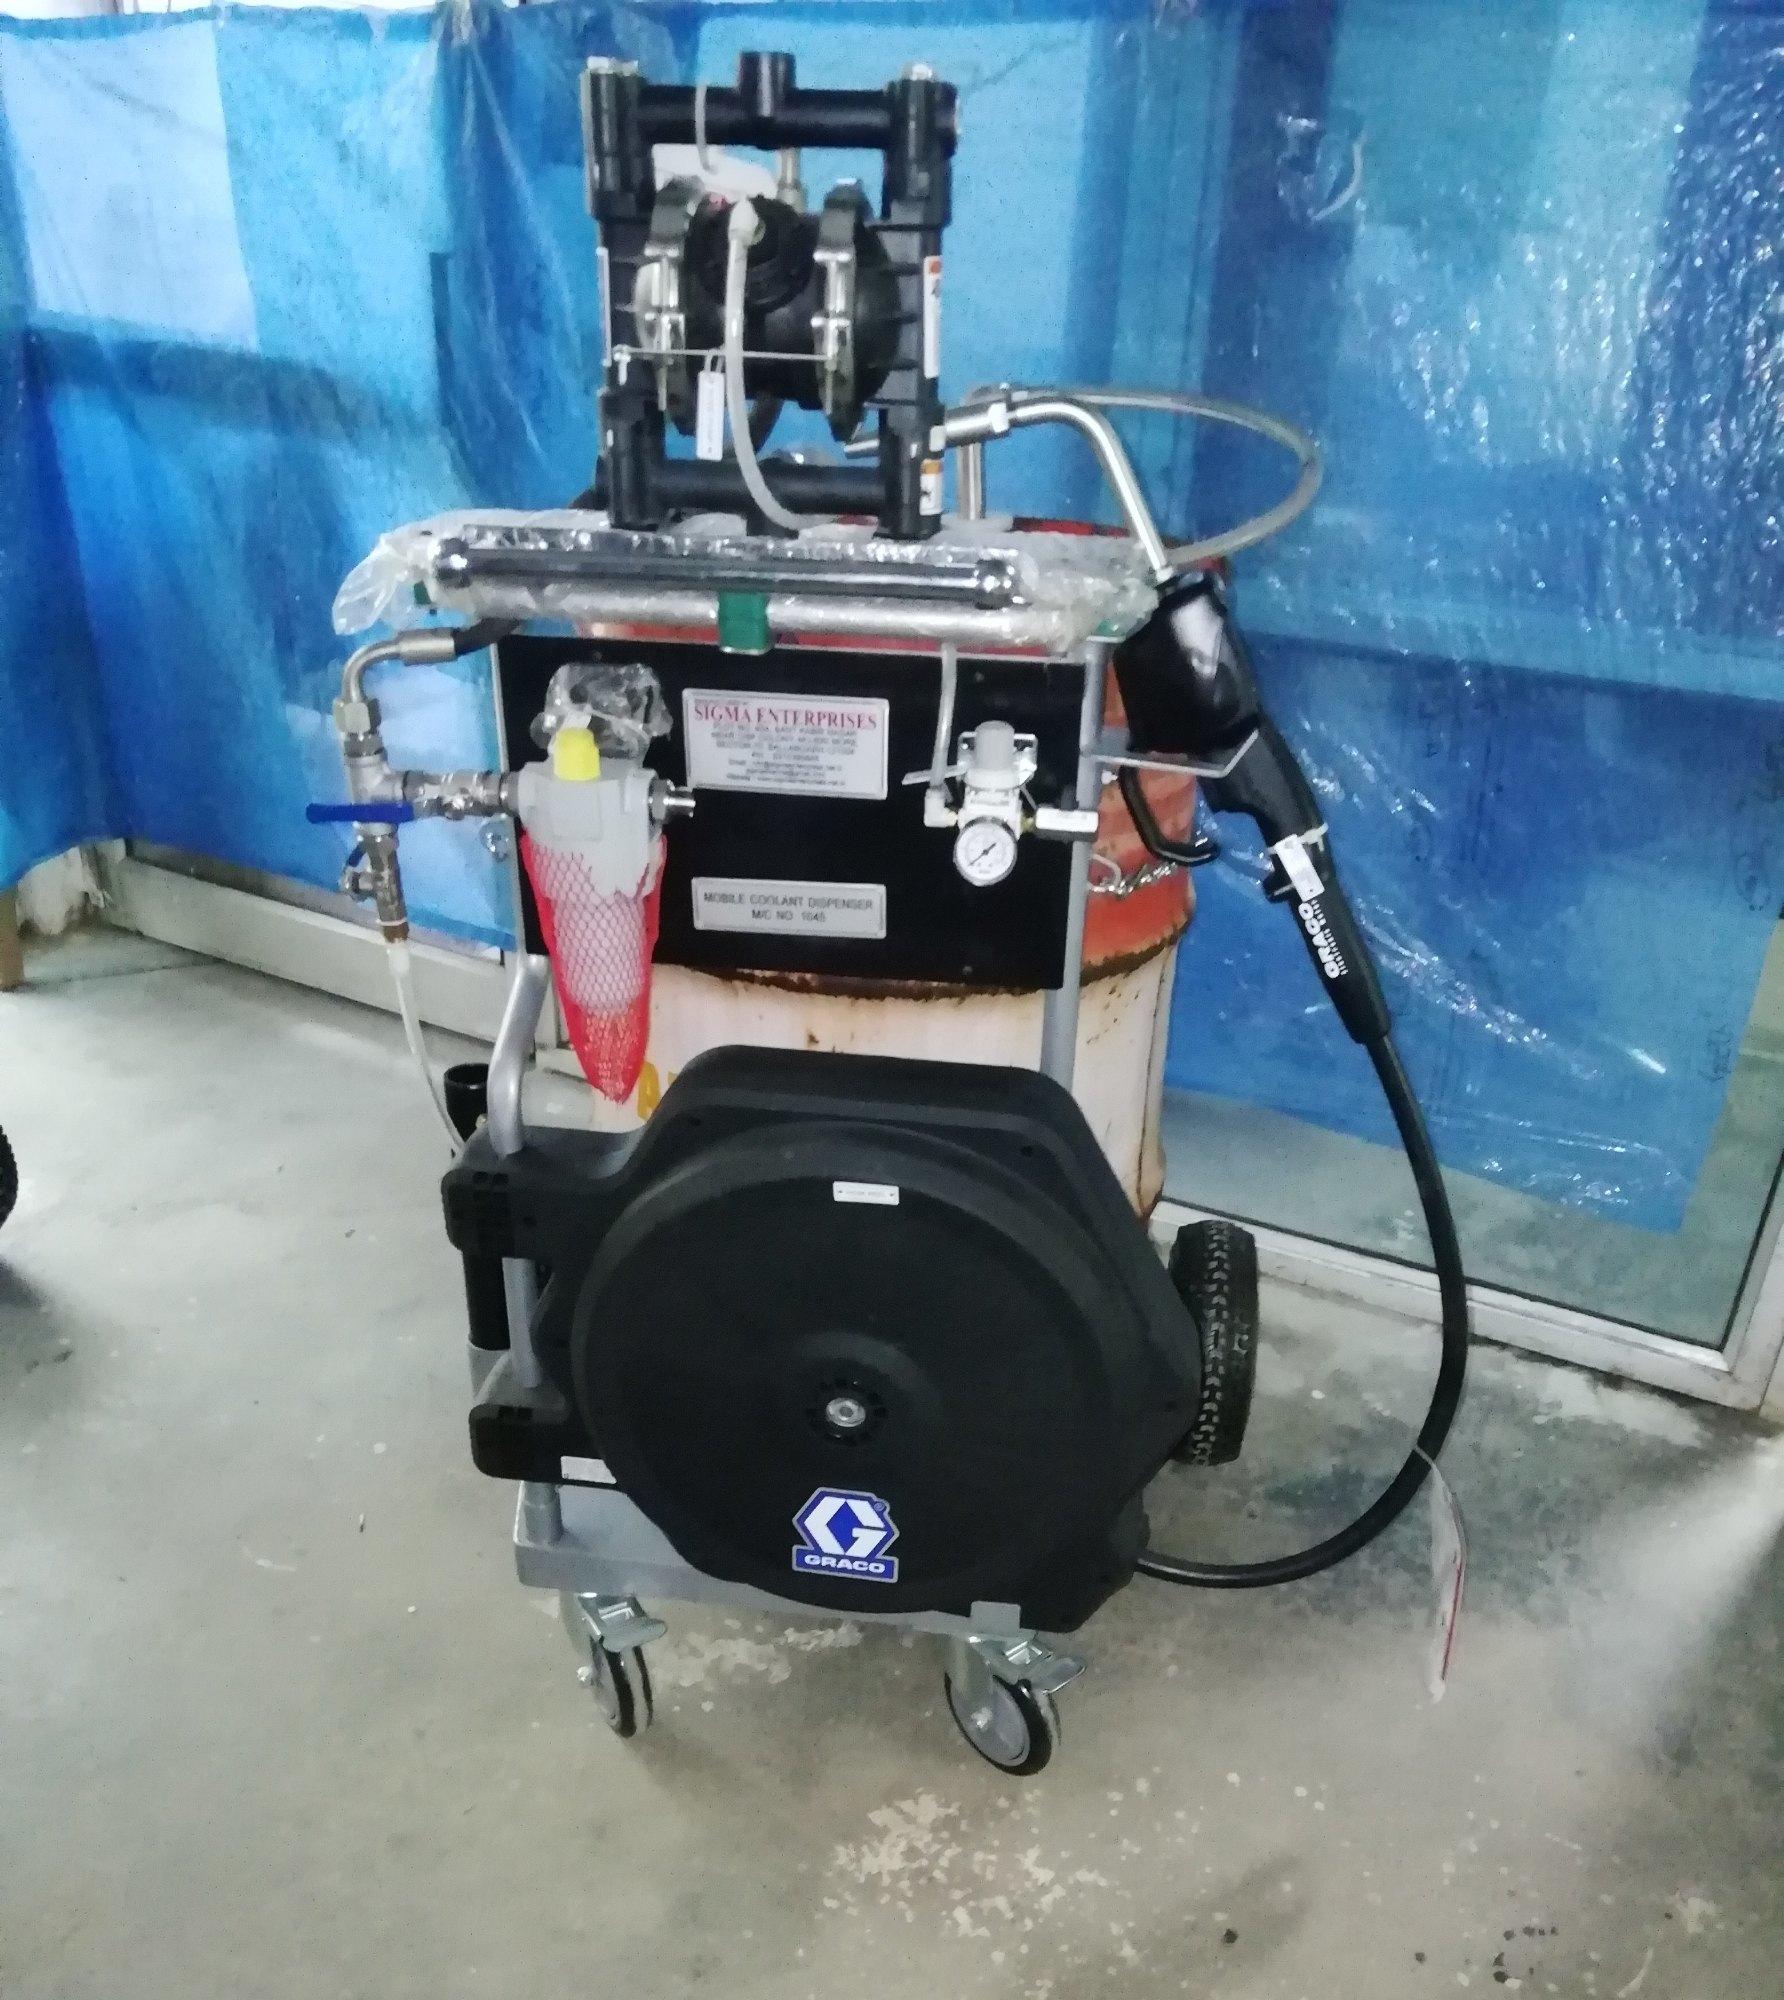 Cart based metered dispensing